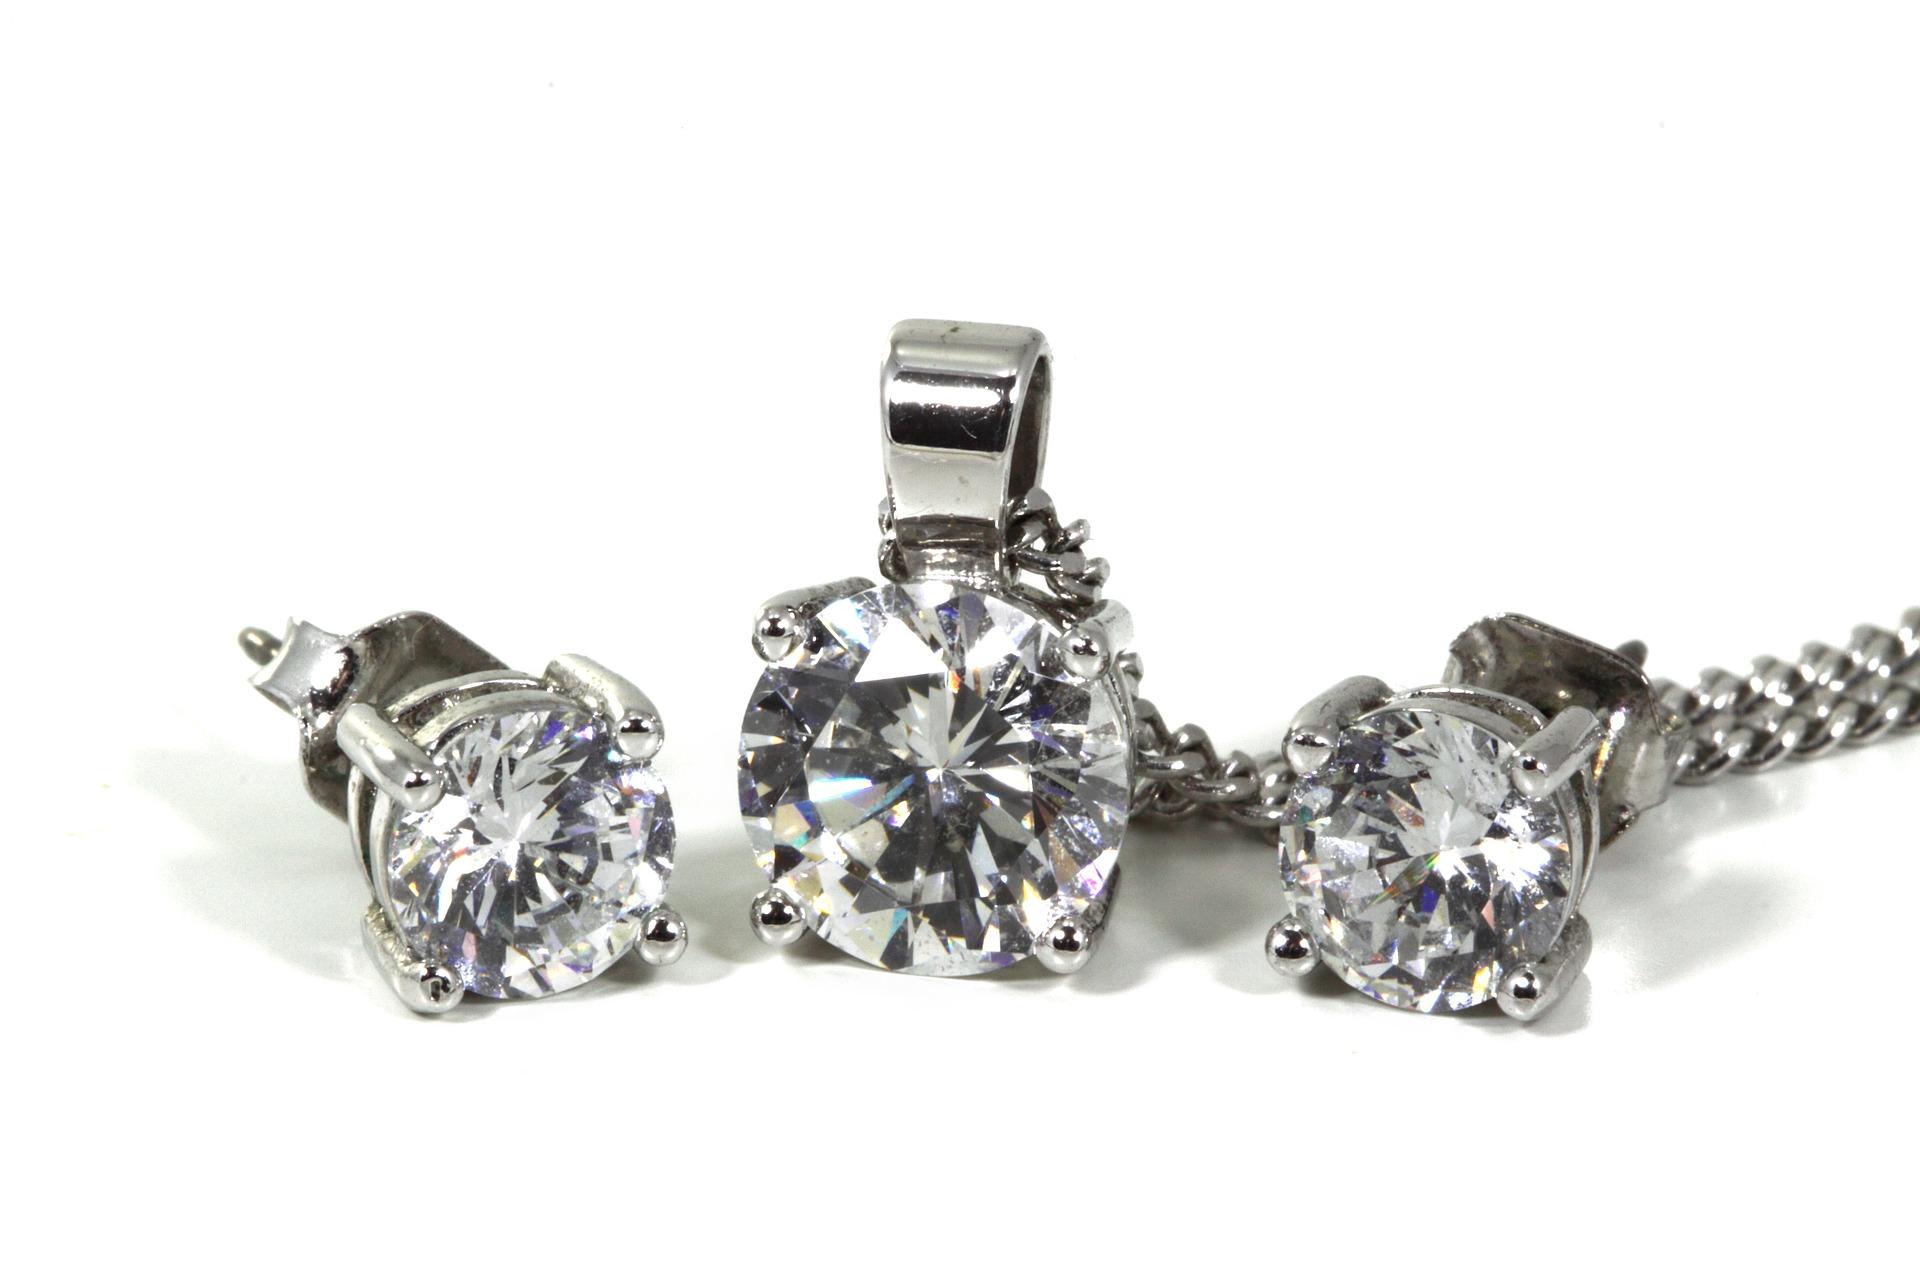 jewellery-2043_1920.jpg